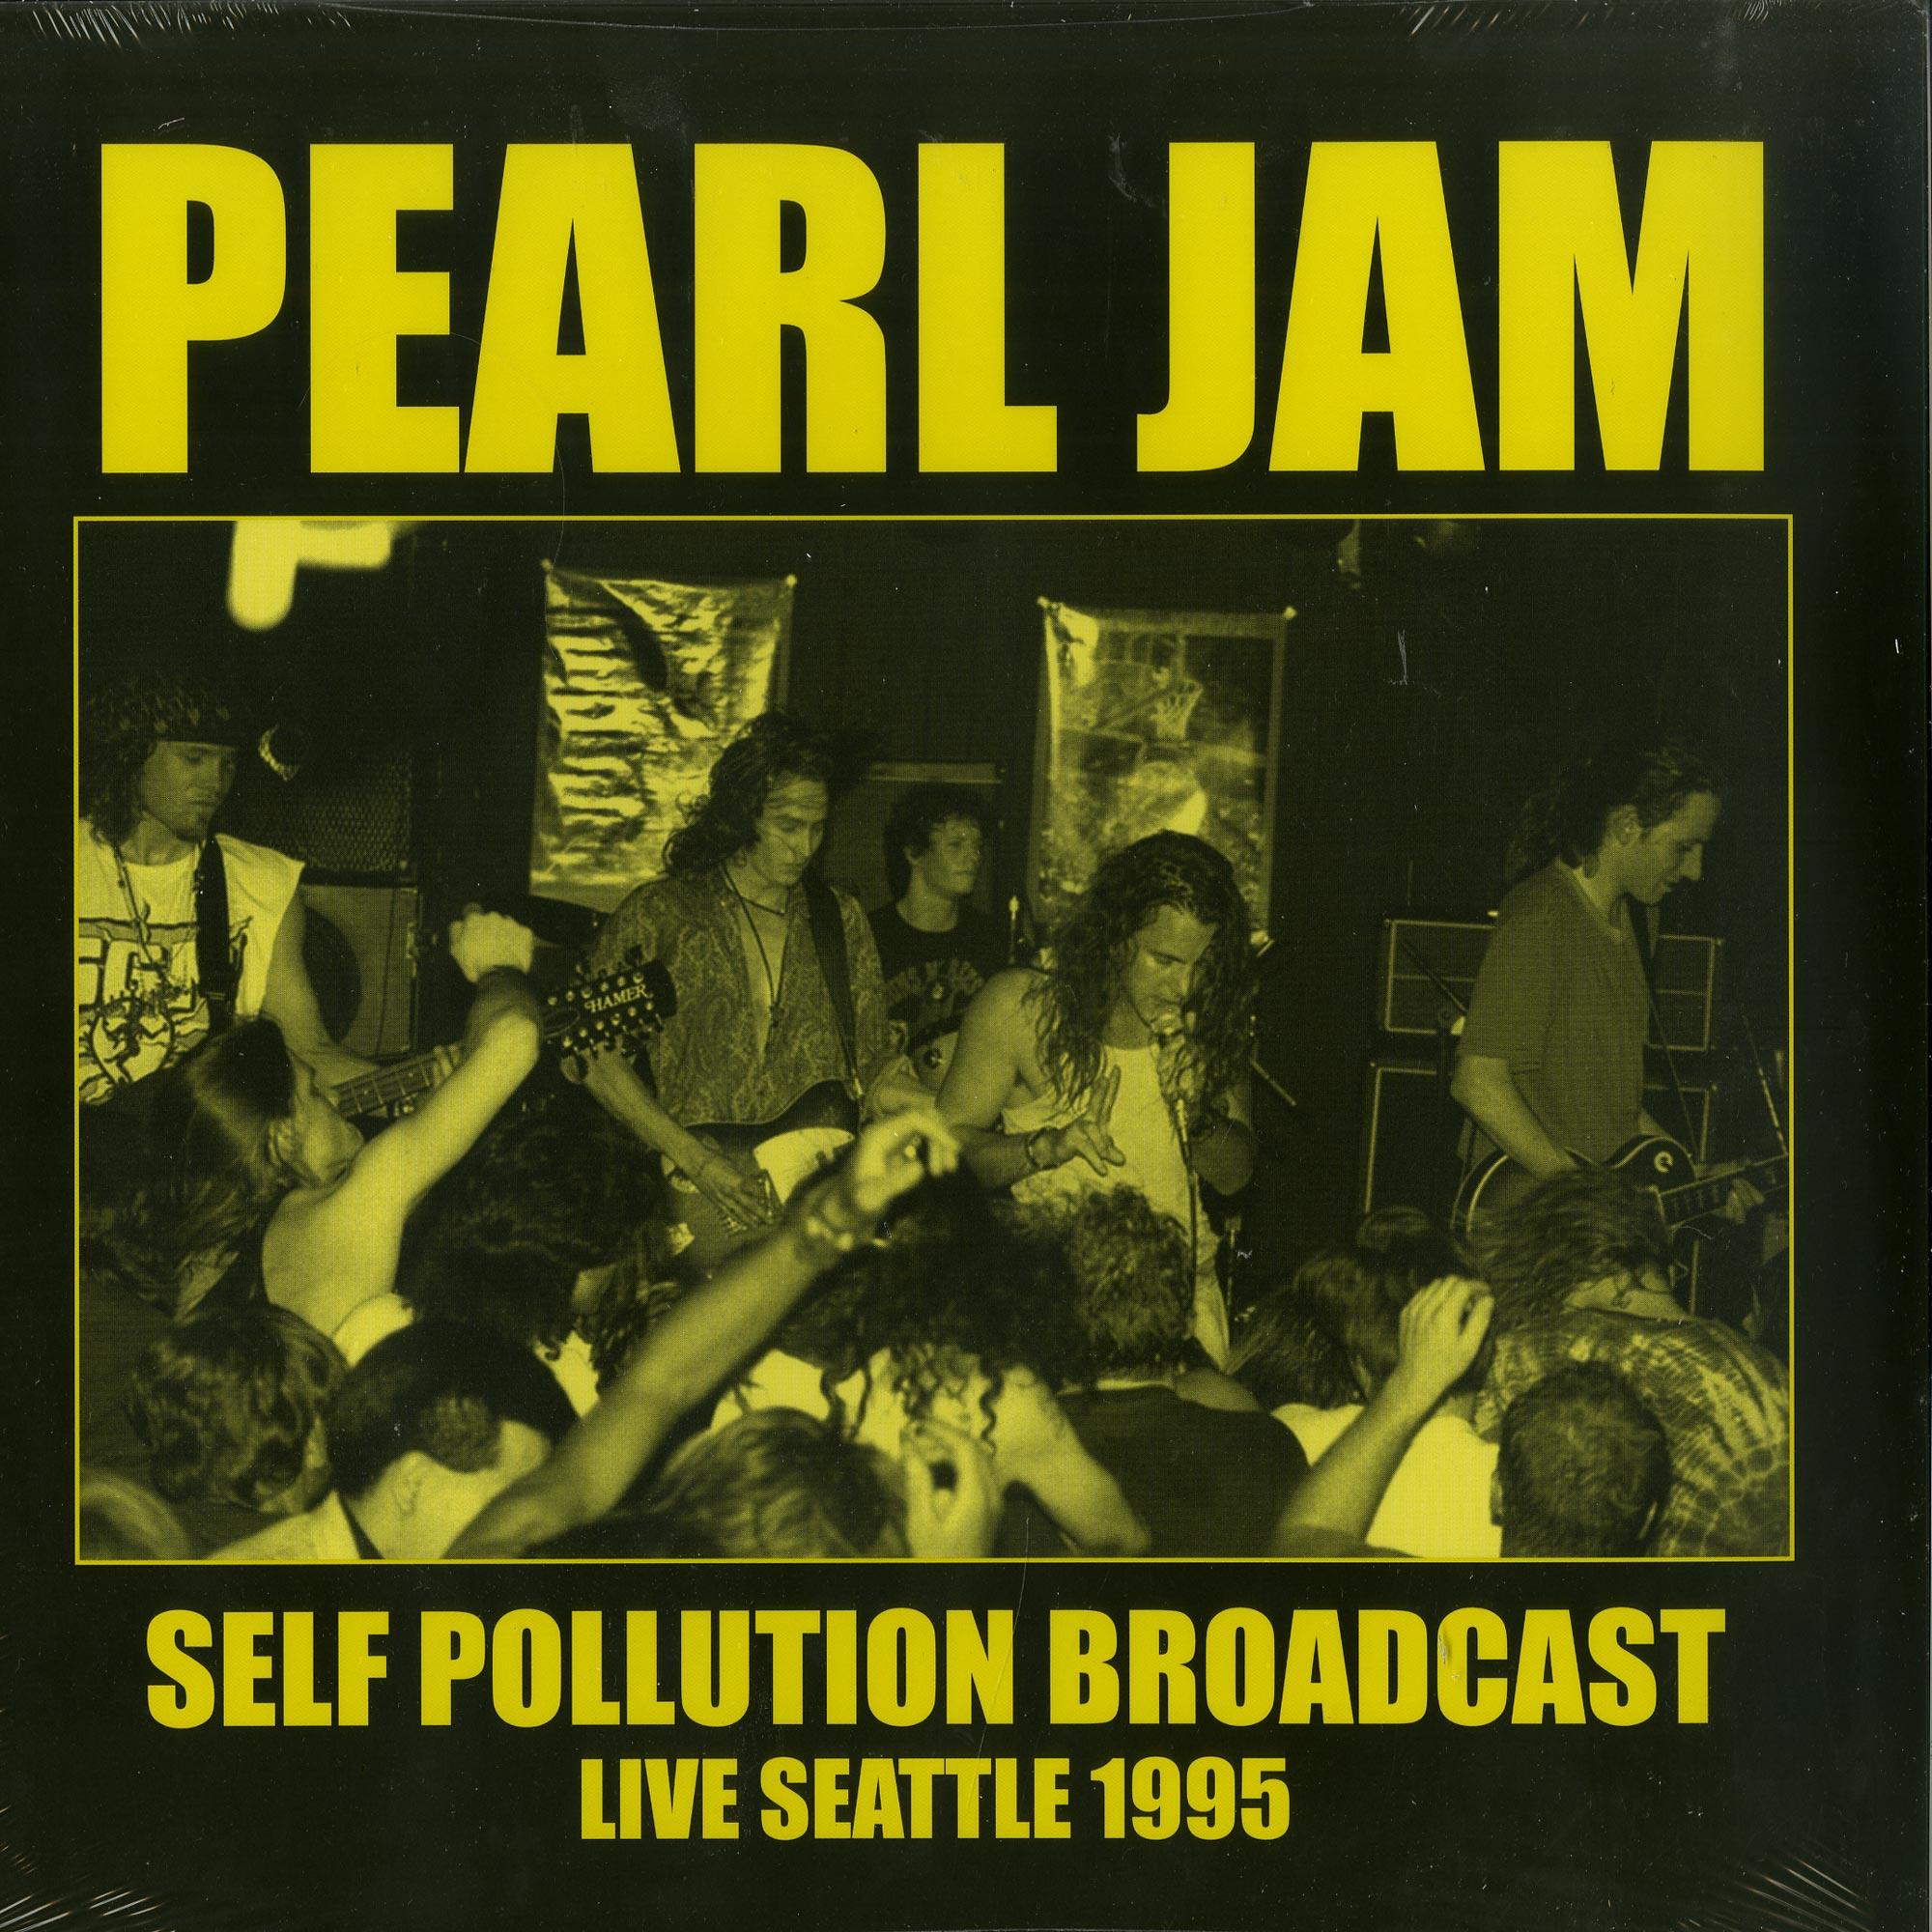 Pearl Jam - SELF POLLUTION BROADCAST